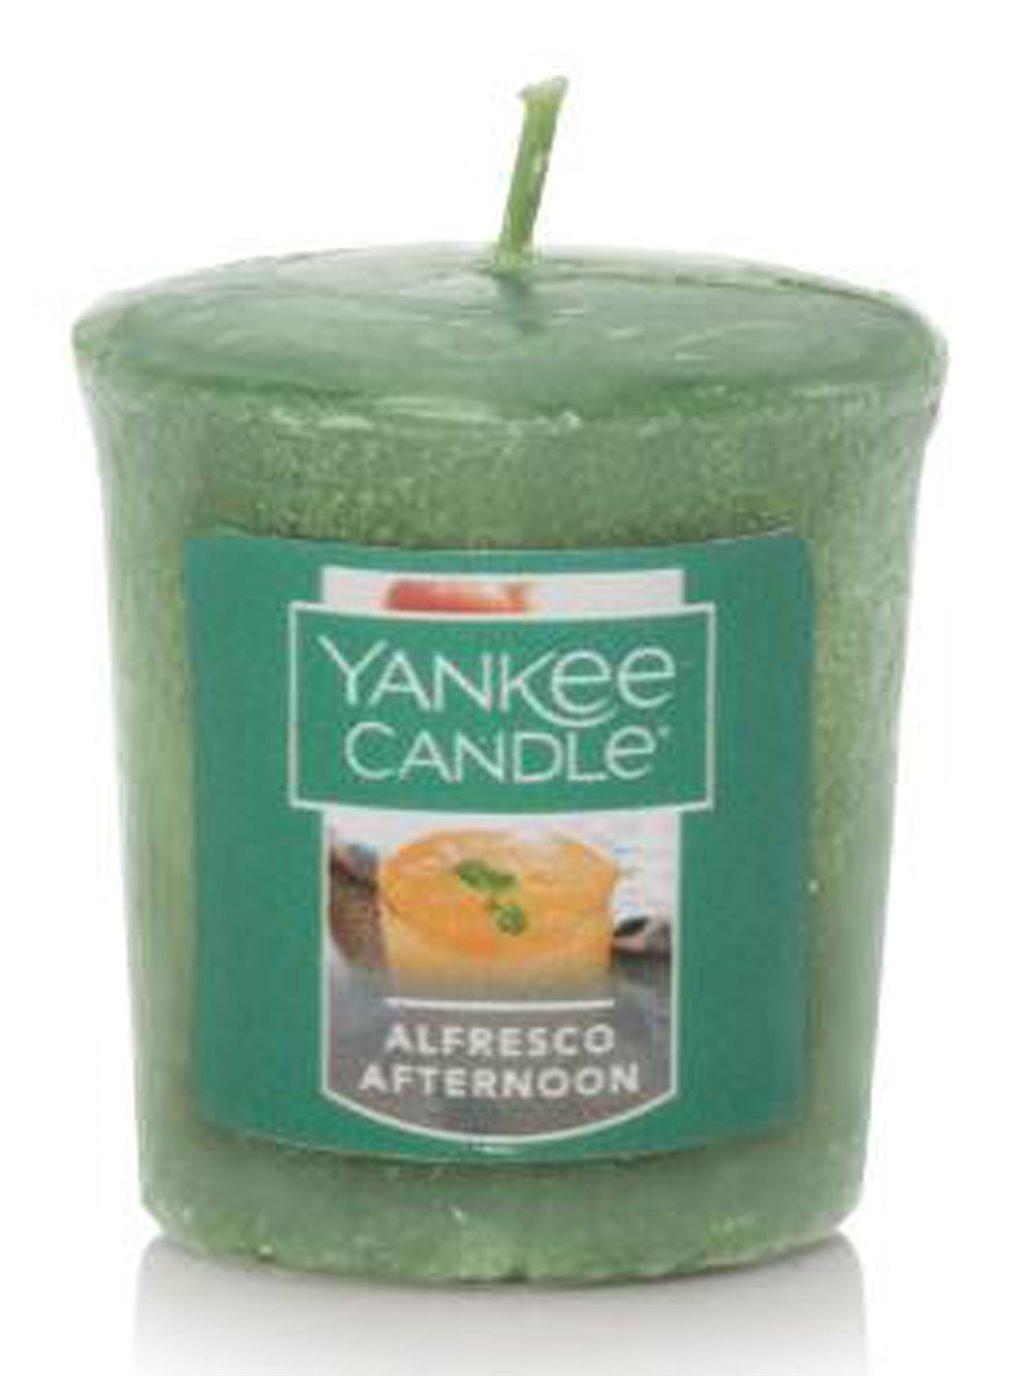 Yankee Candle Alfresco Afternoon Sampler Votive